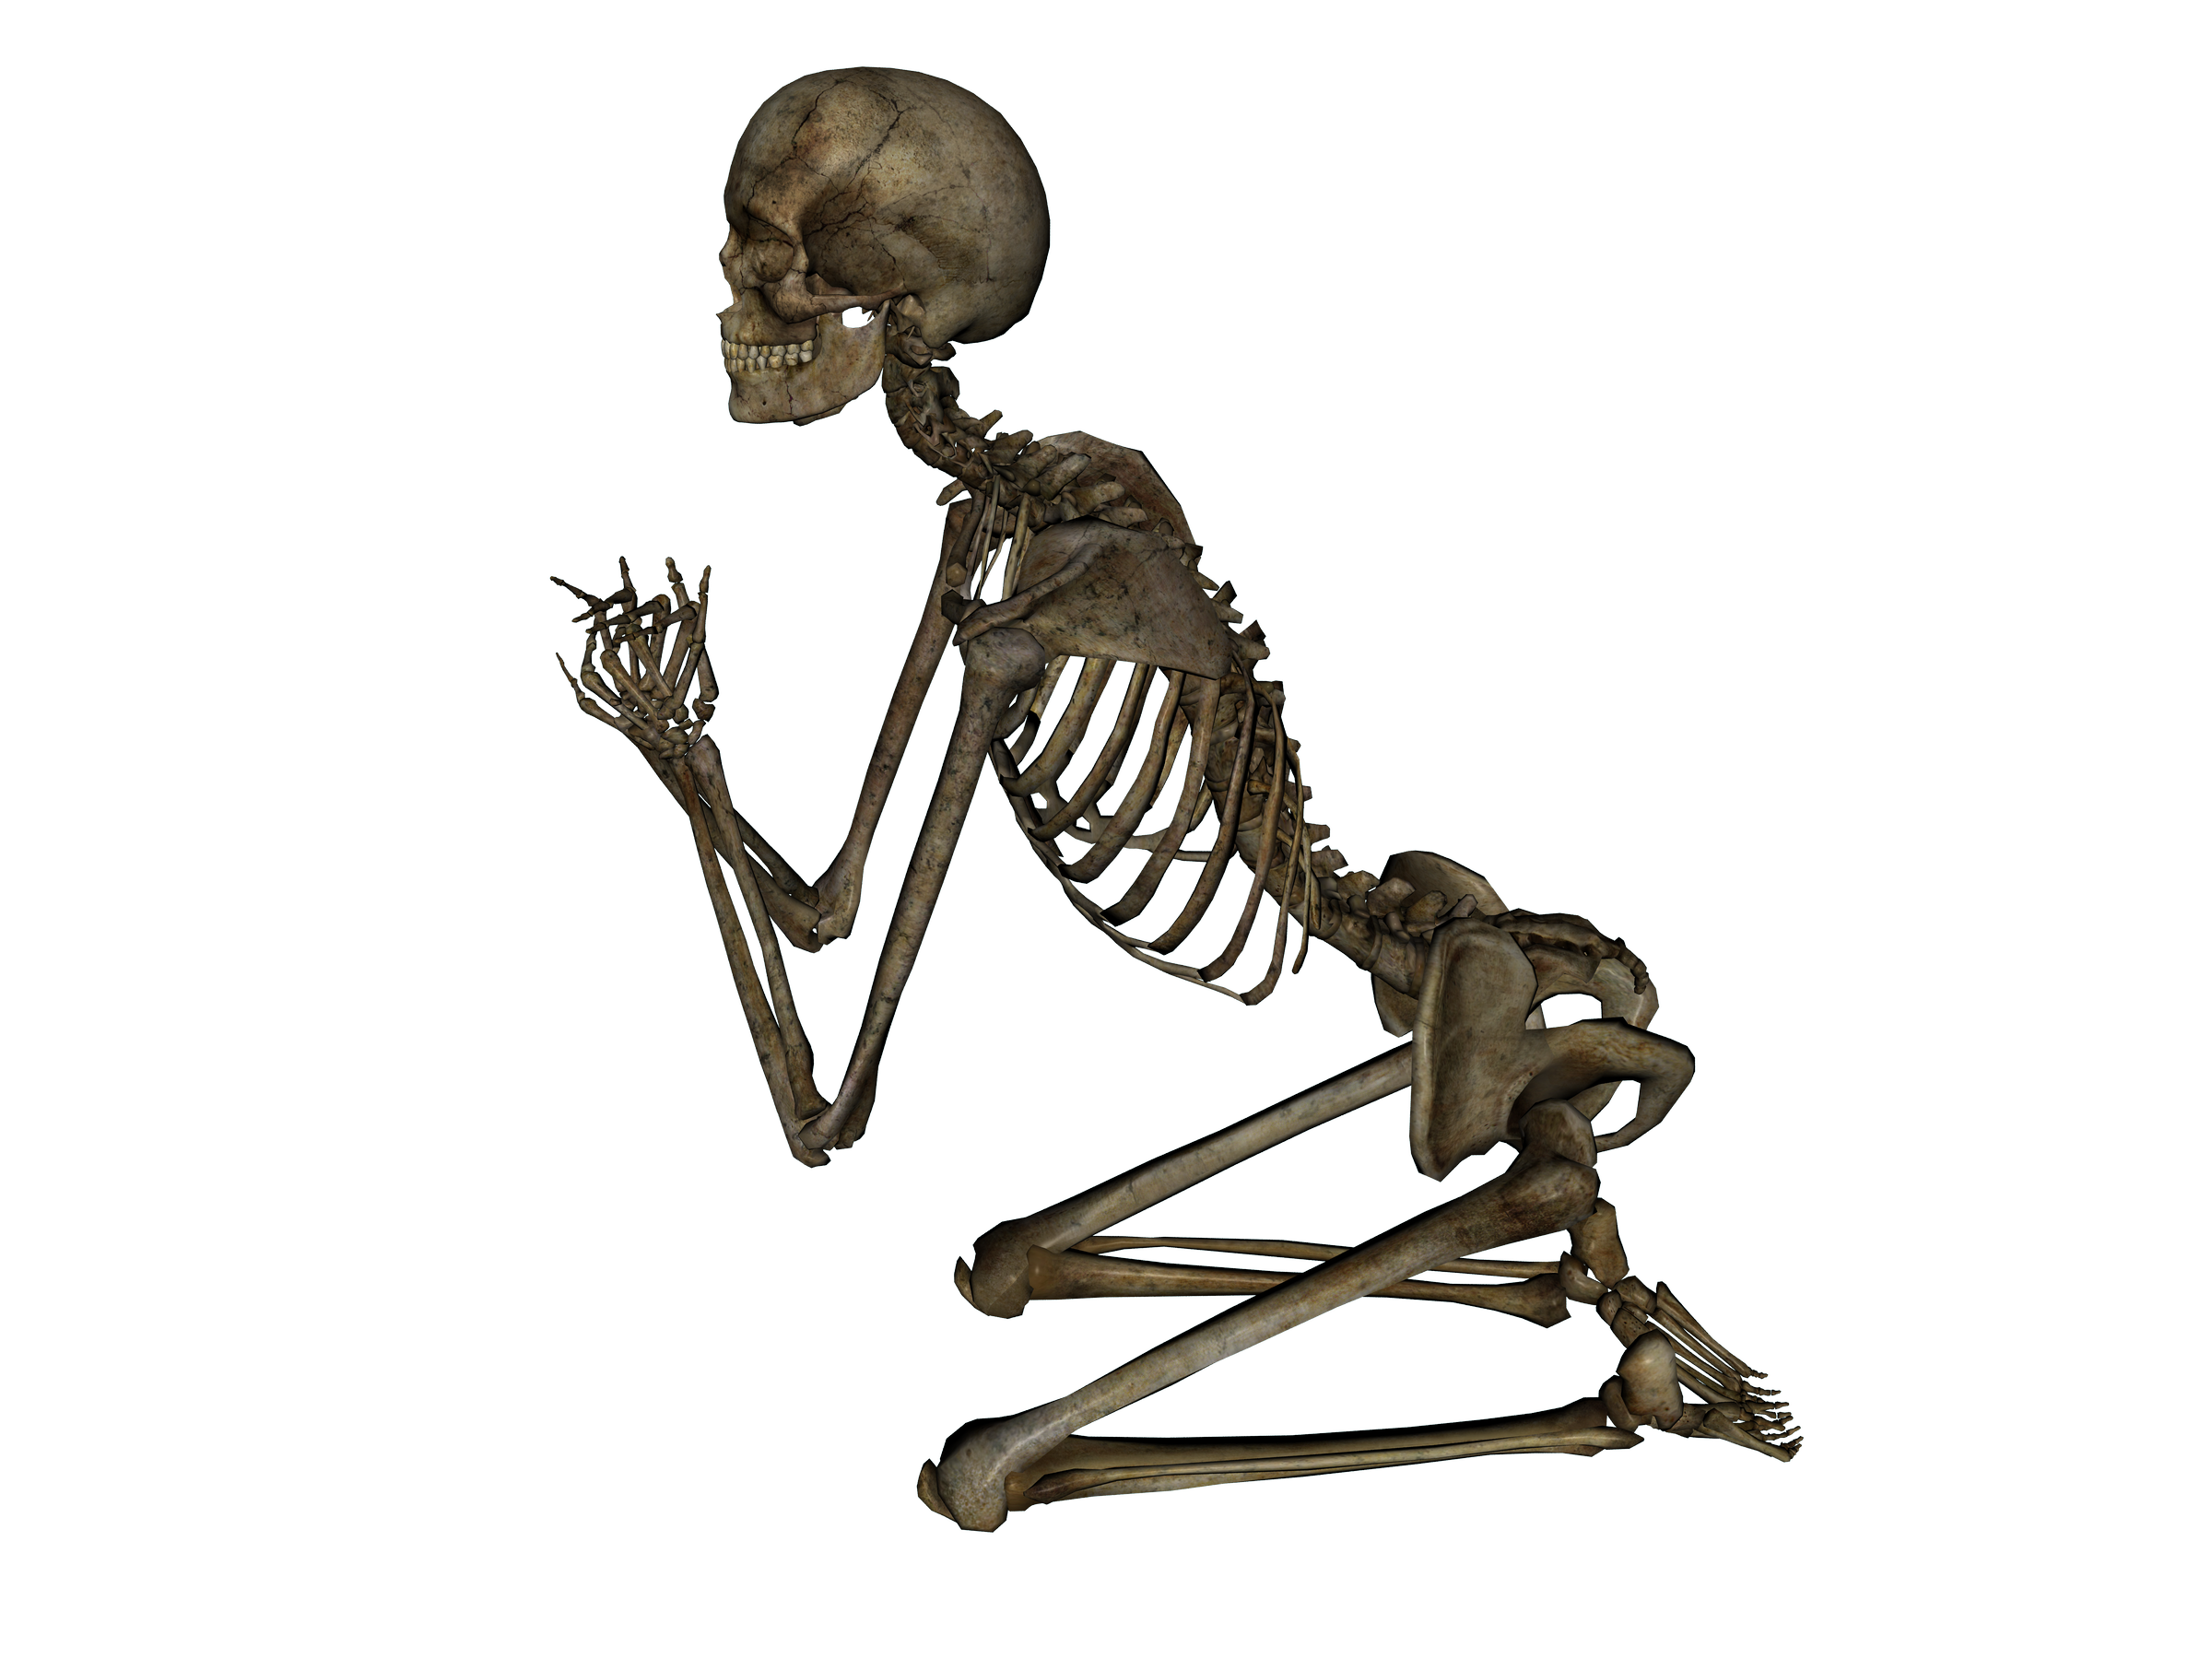 Skeleton - Praying by markopolio-stock